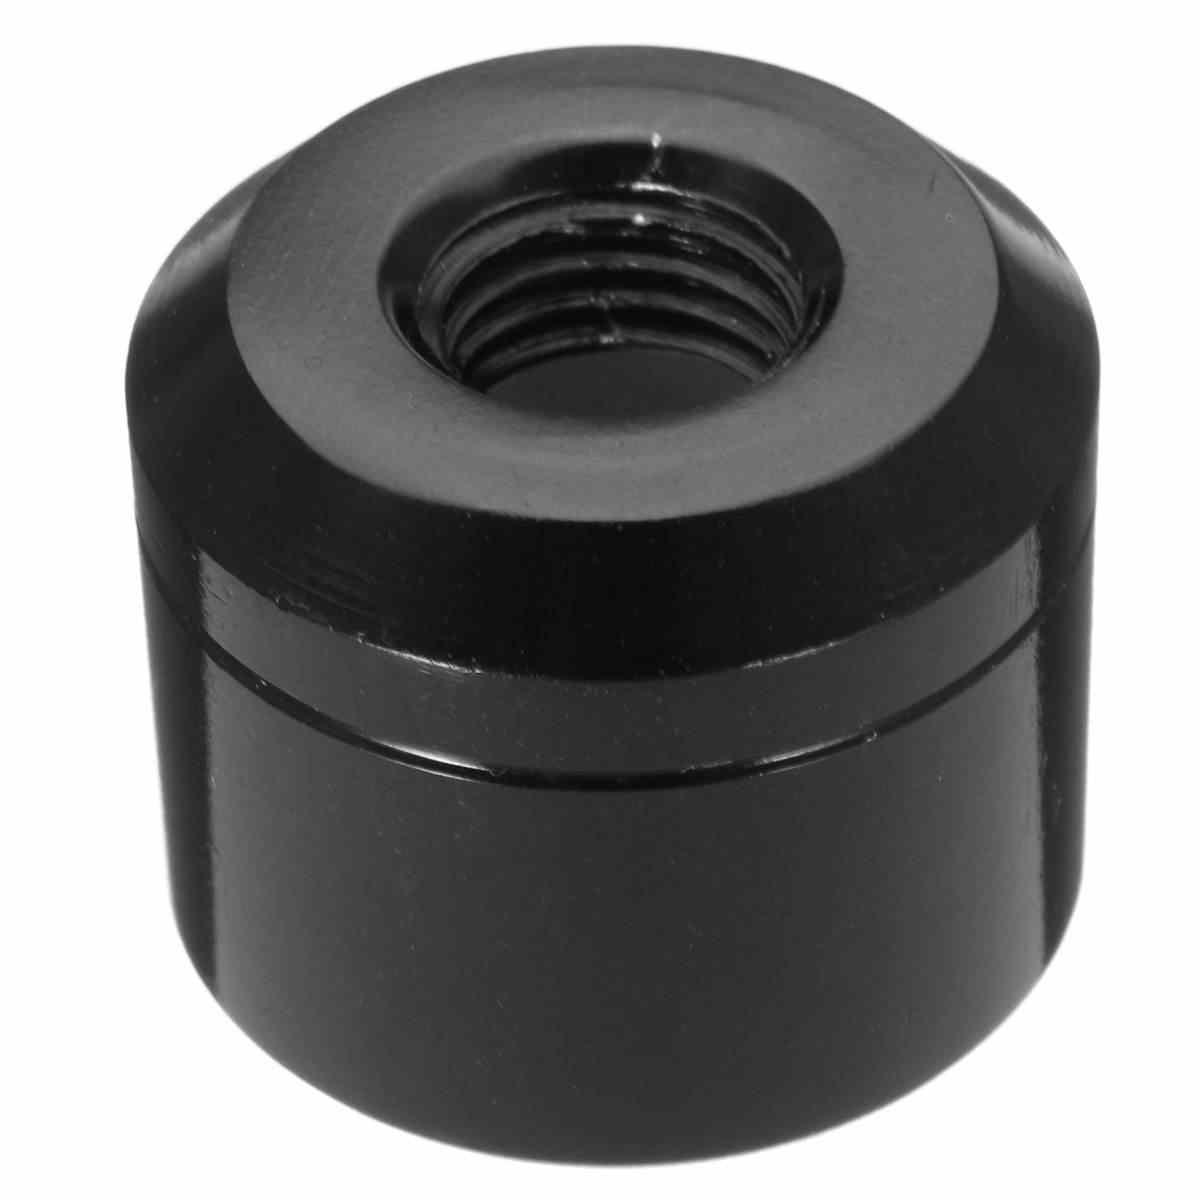 M10x1.25 M12X1.25 adaptador de palanca de cambios de bloqueo inverso para palanca de cambios para accesorios manuales